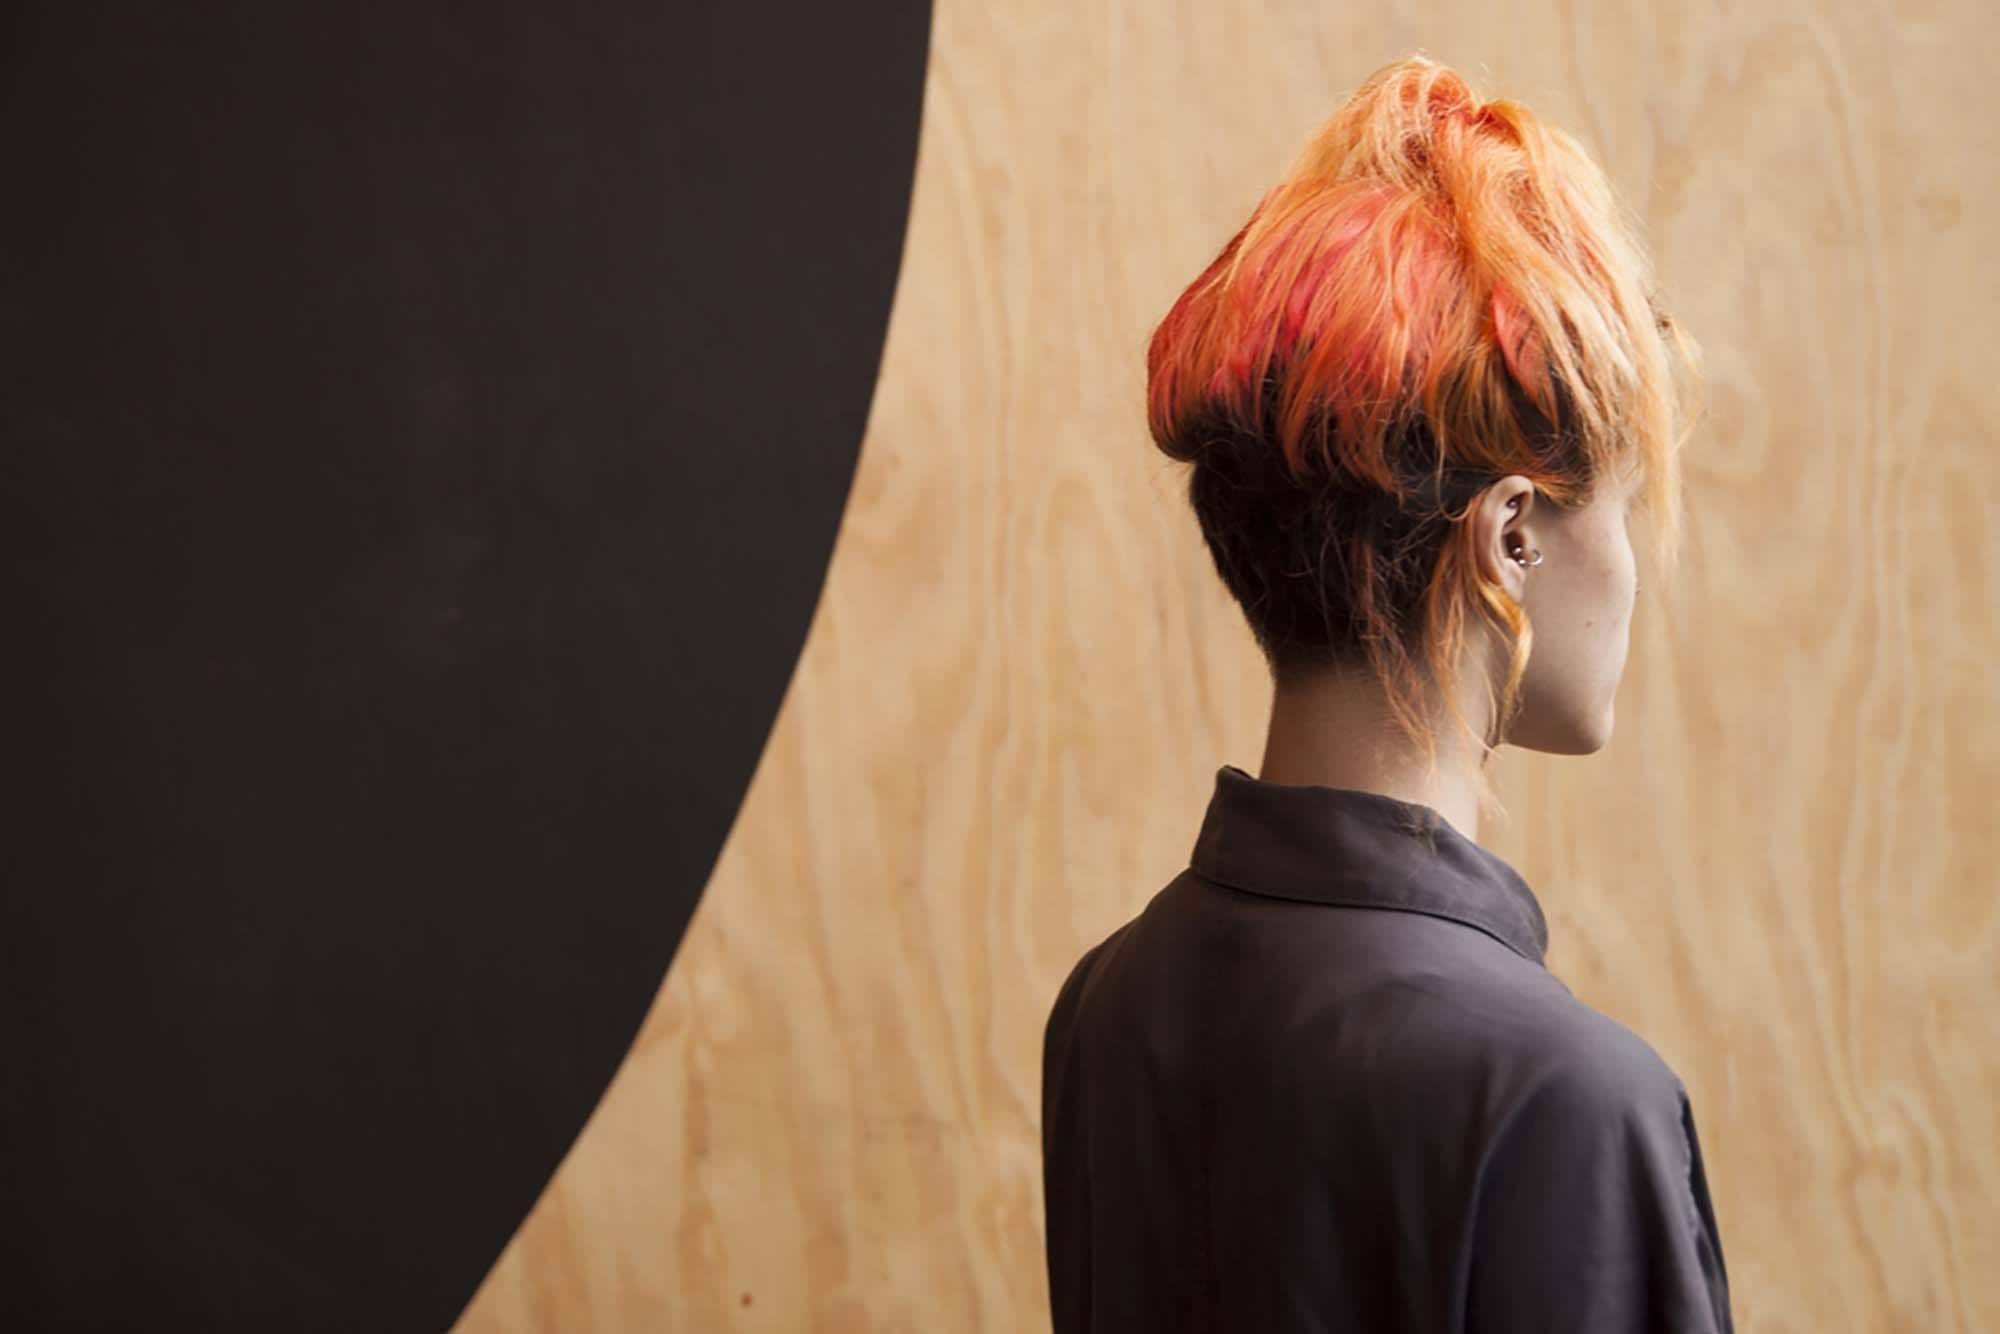 Beautiful women with blood orange hair worn in a high ponytail